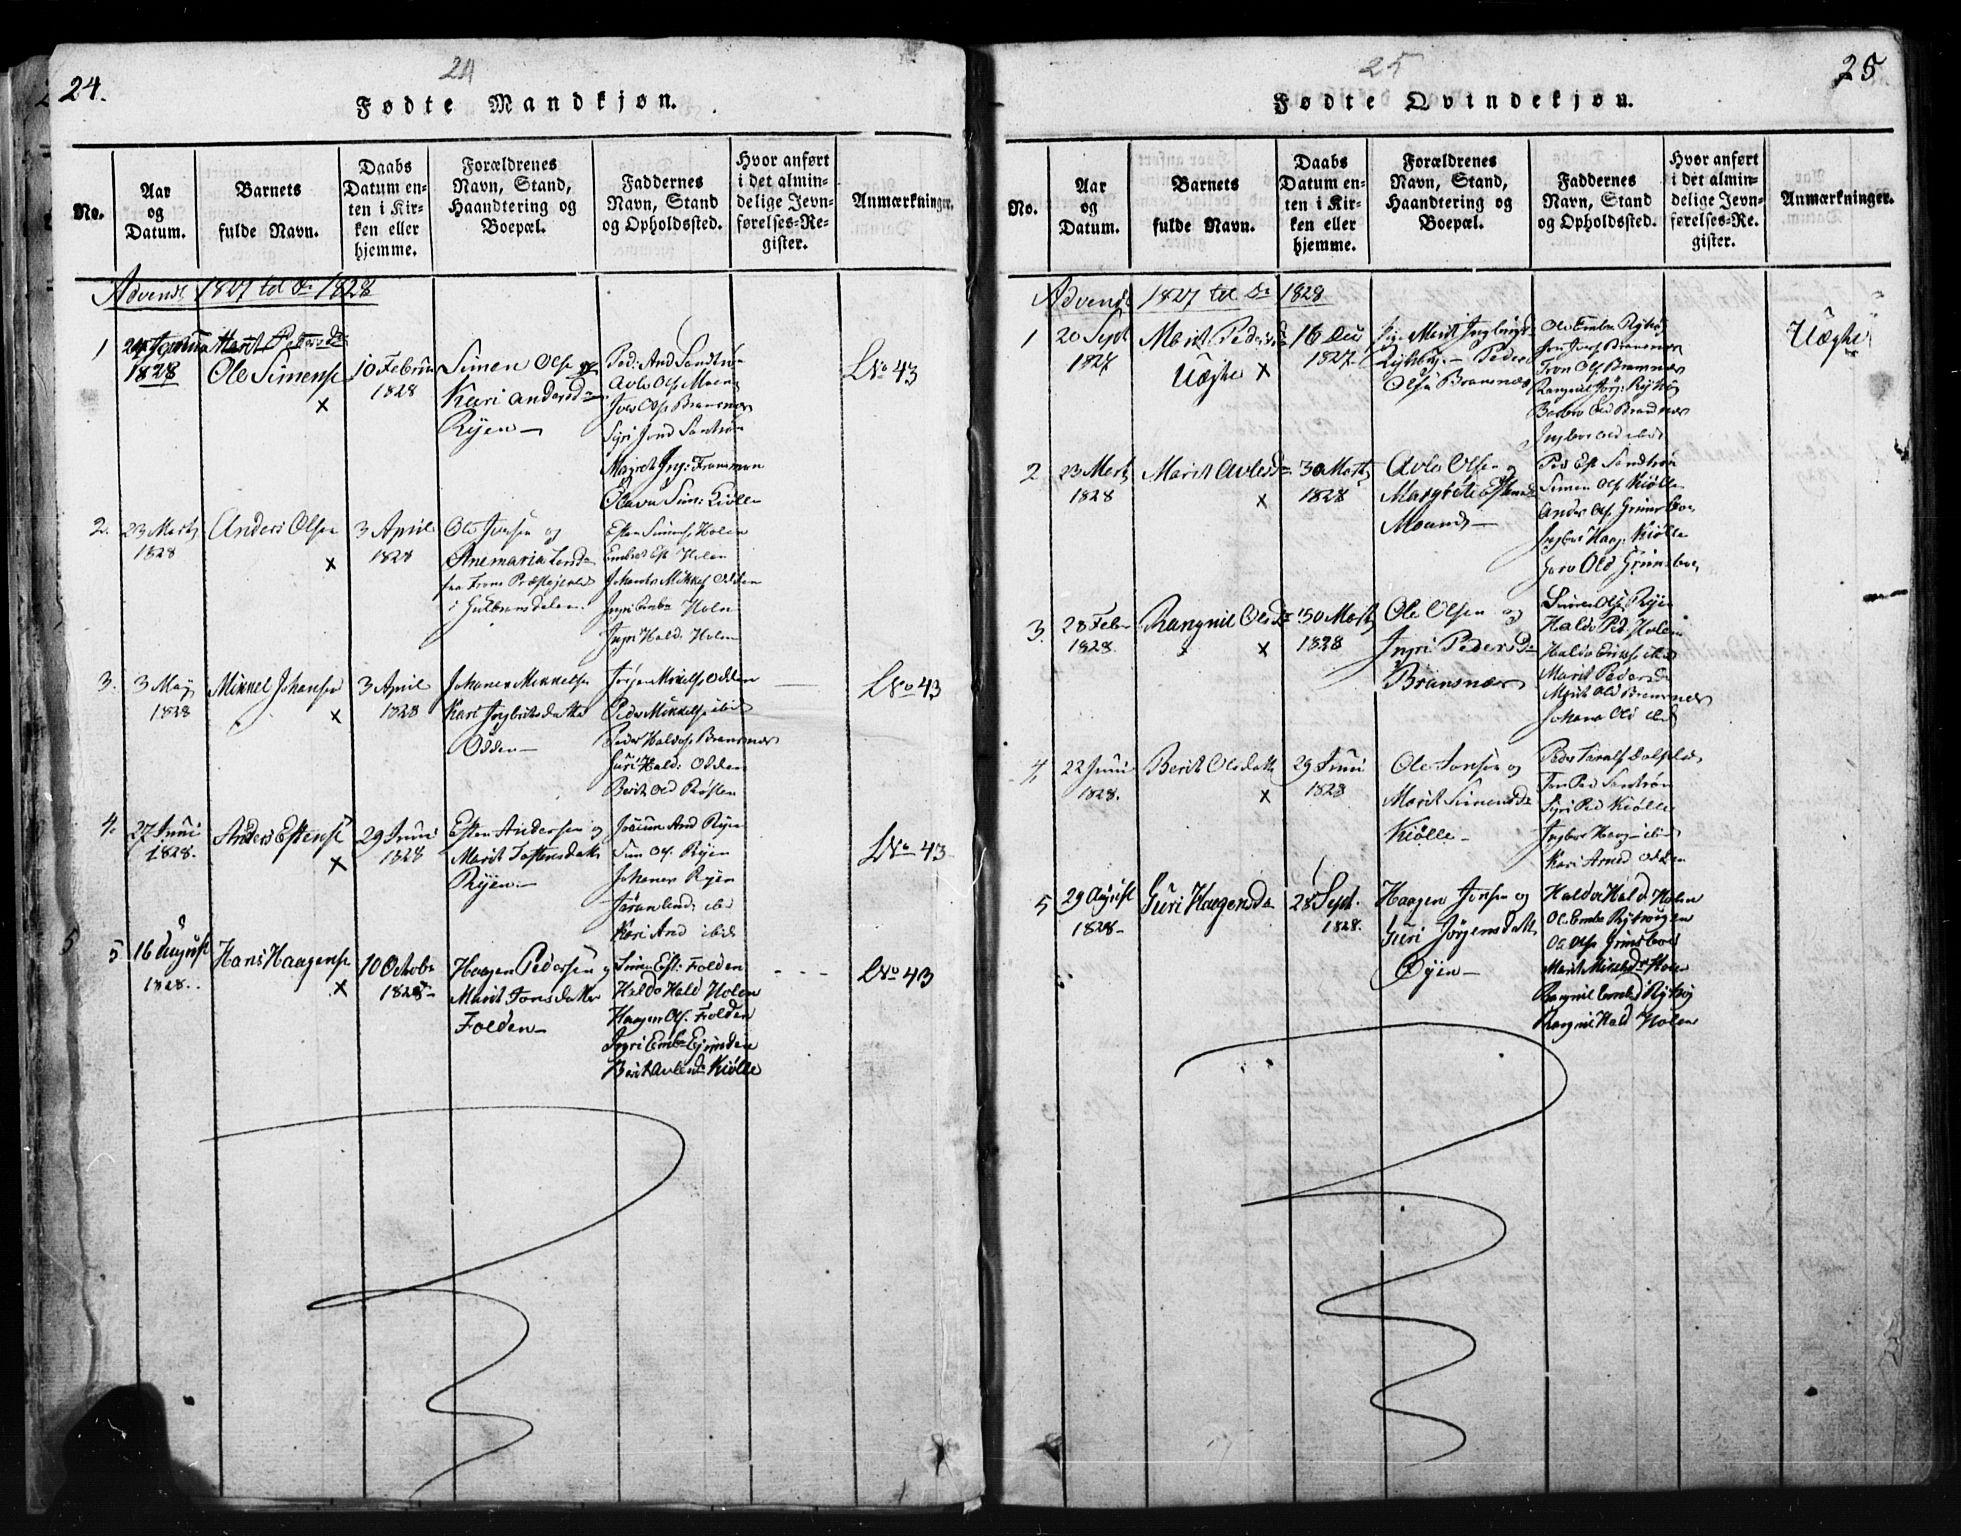 SAH, Tynset prestekontor, Klokkerbok nr. 3, 1814-1862, s. 24-25